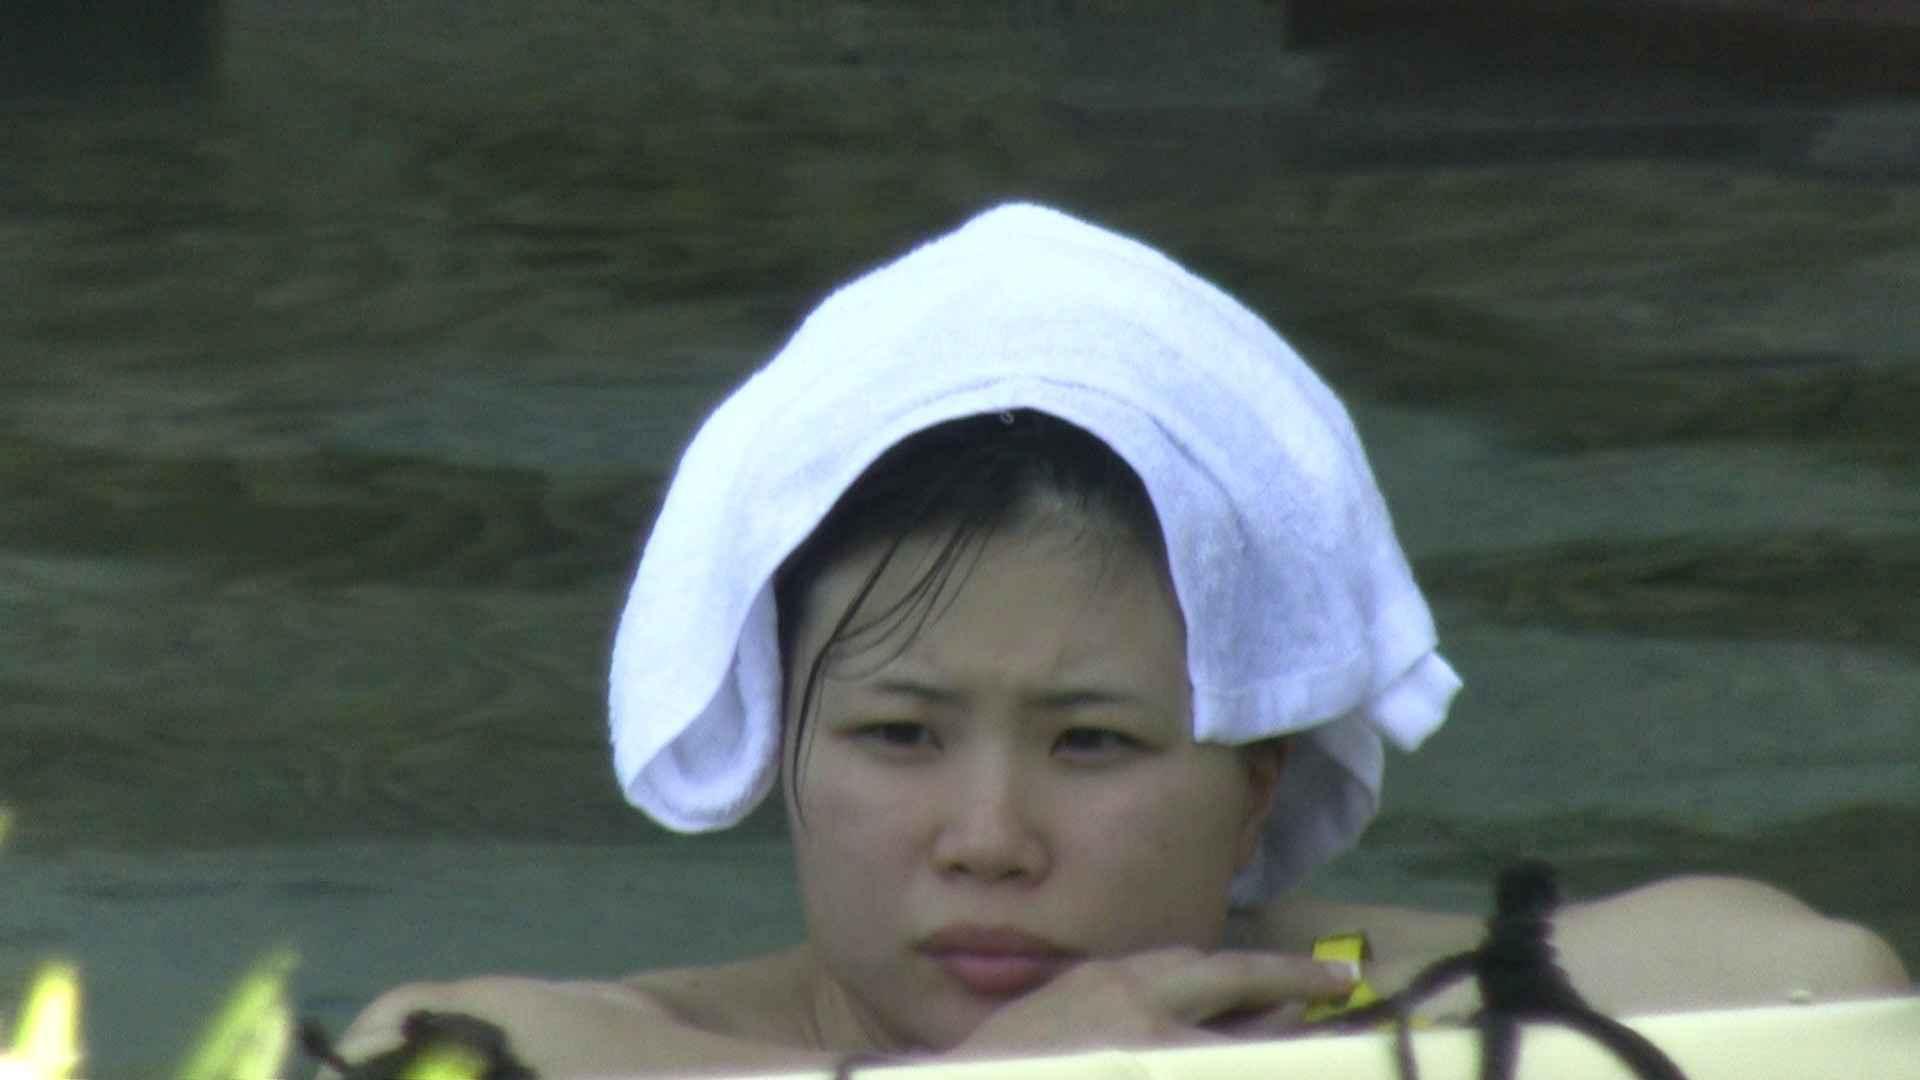 Aquaな露天風呂Vol.183 露天風呂編 | 盗撮シリーズ  104PIX 51